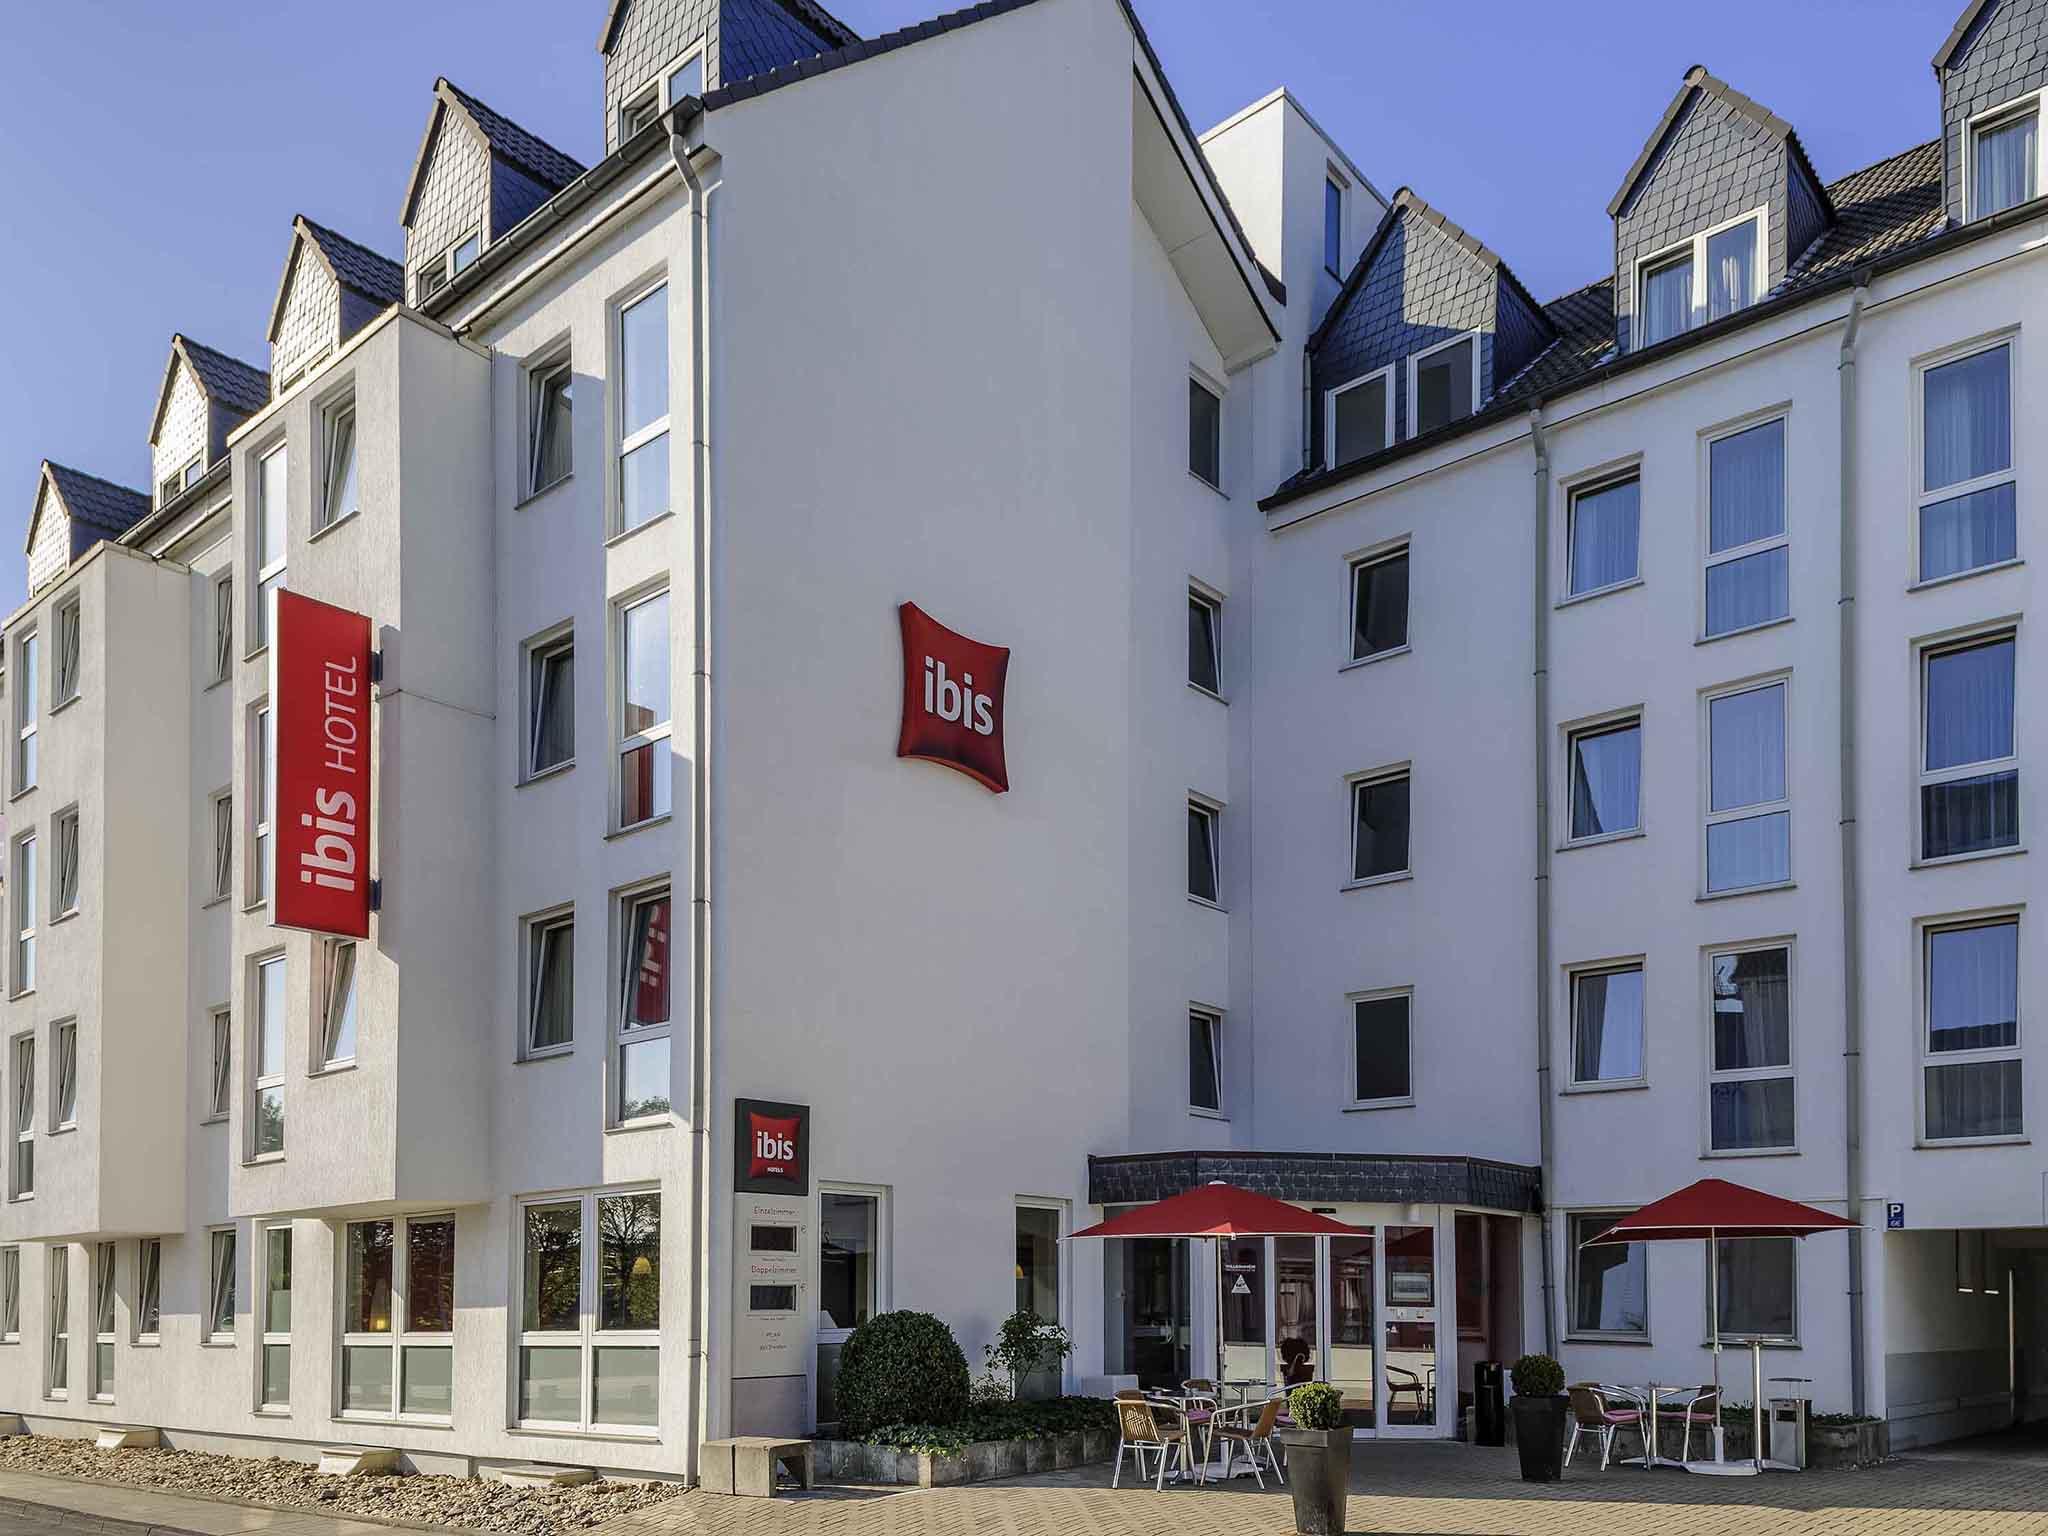 Hotel Ibis Koln Leverkusen